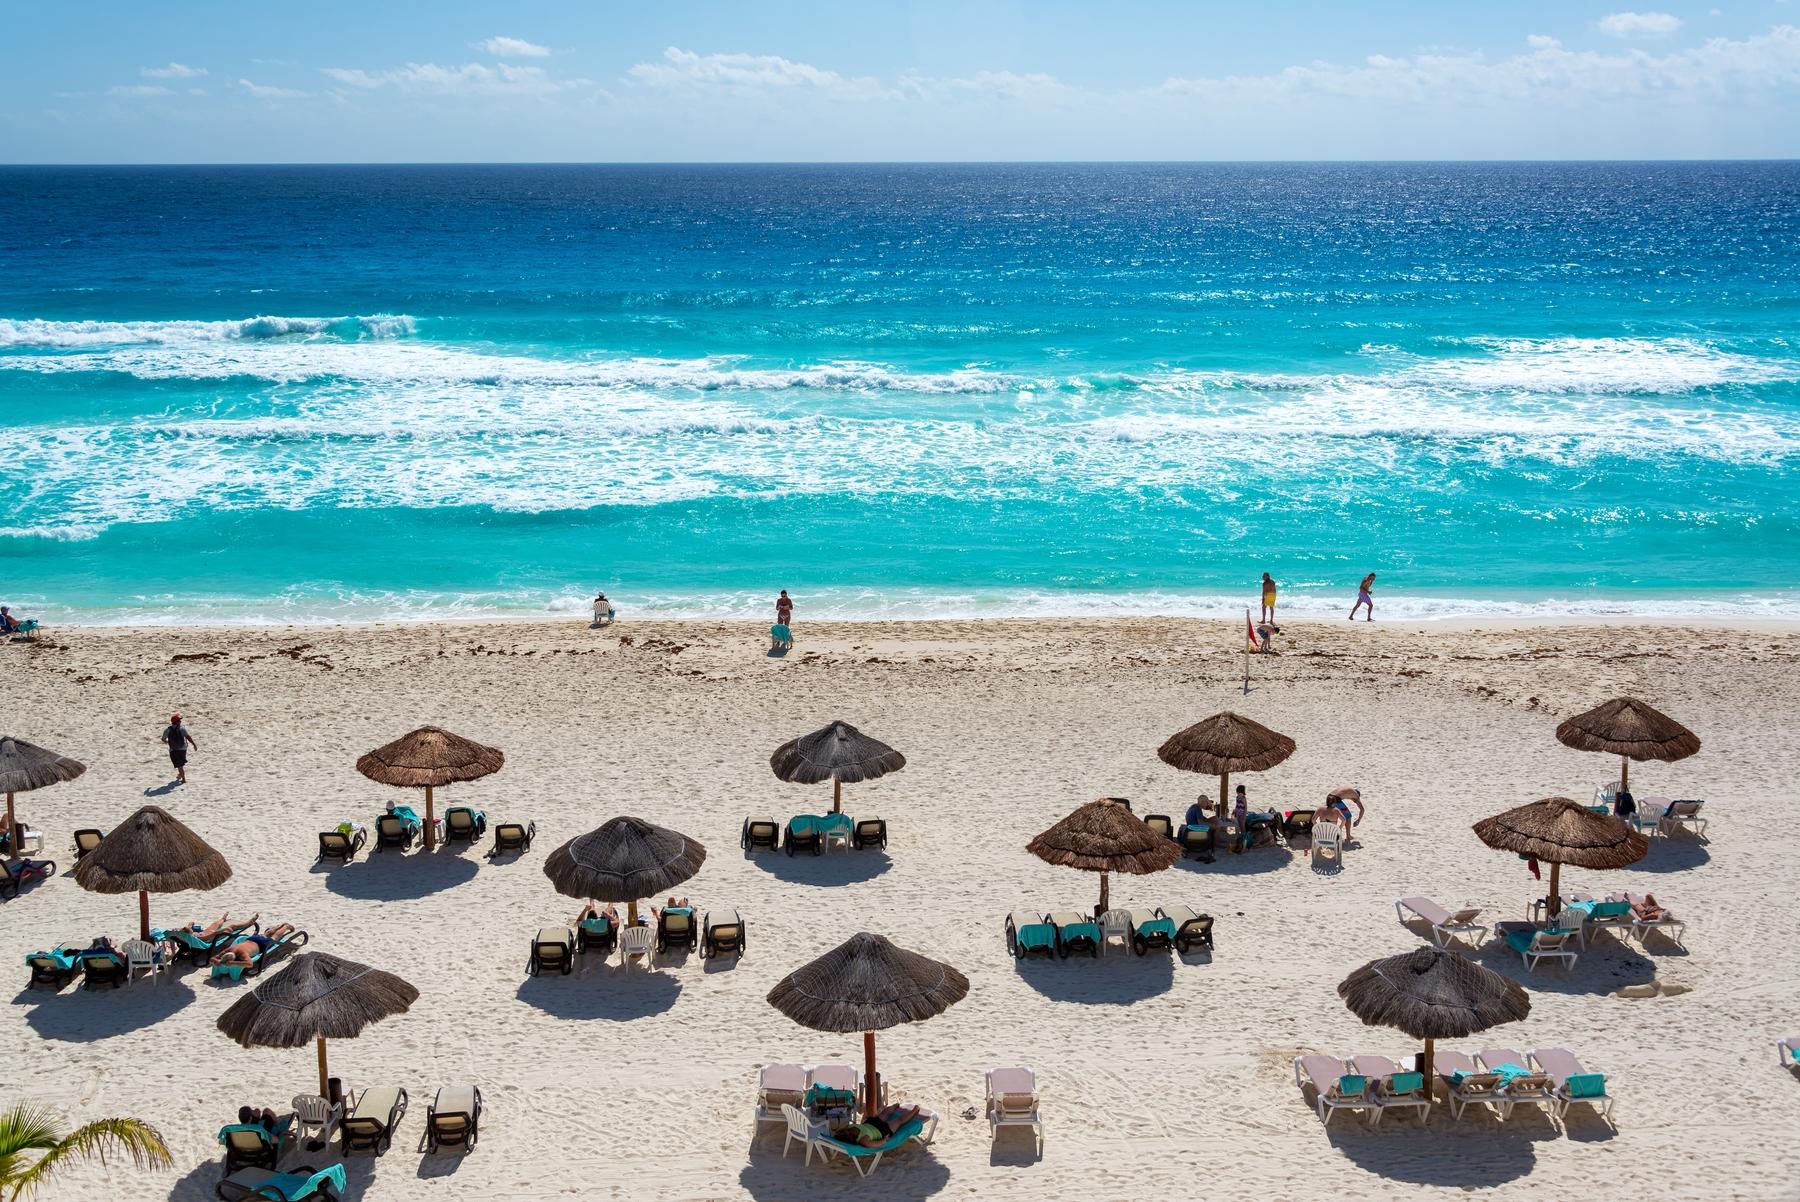 Beira da praia de Cancún com o mar azul celeste visto de cima.